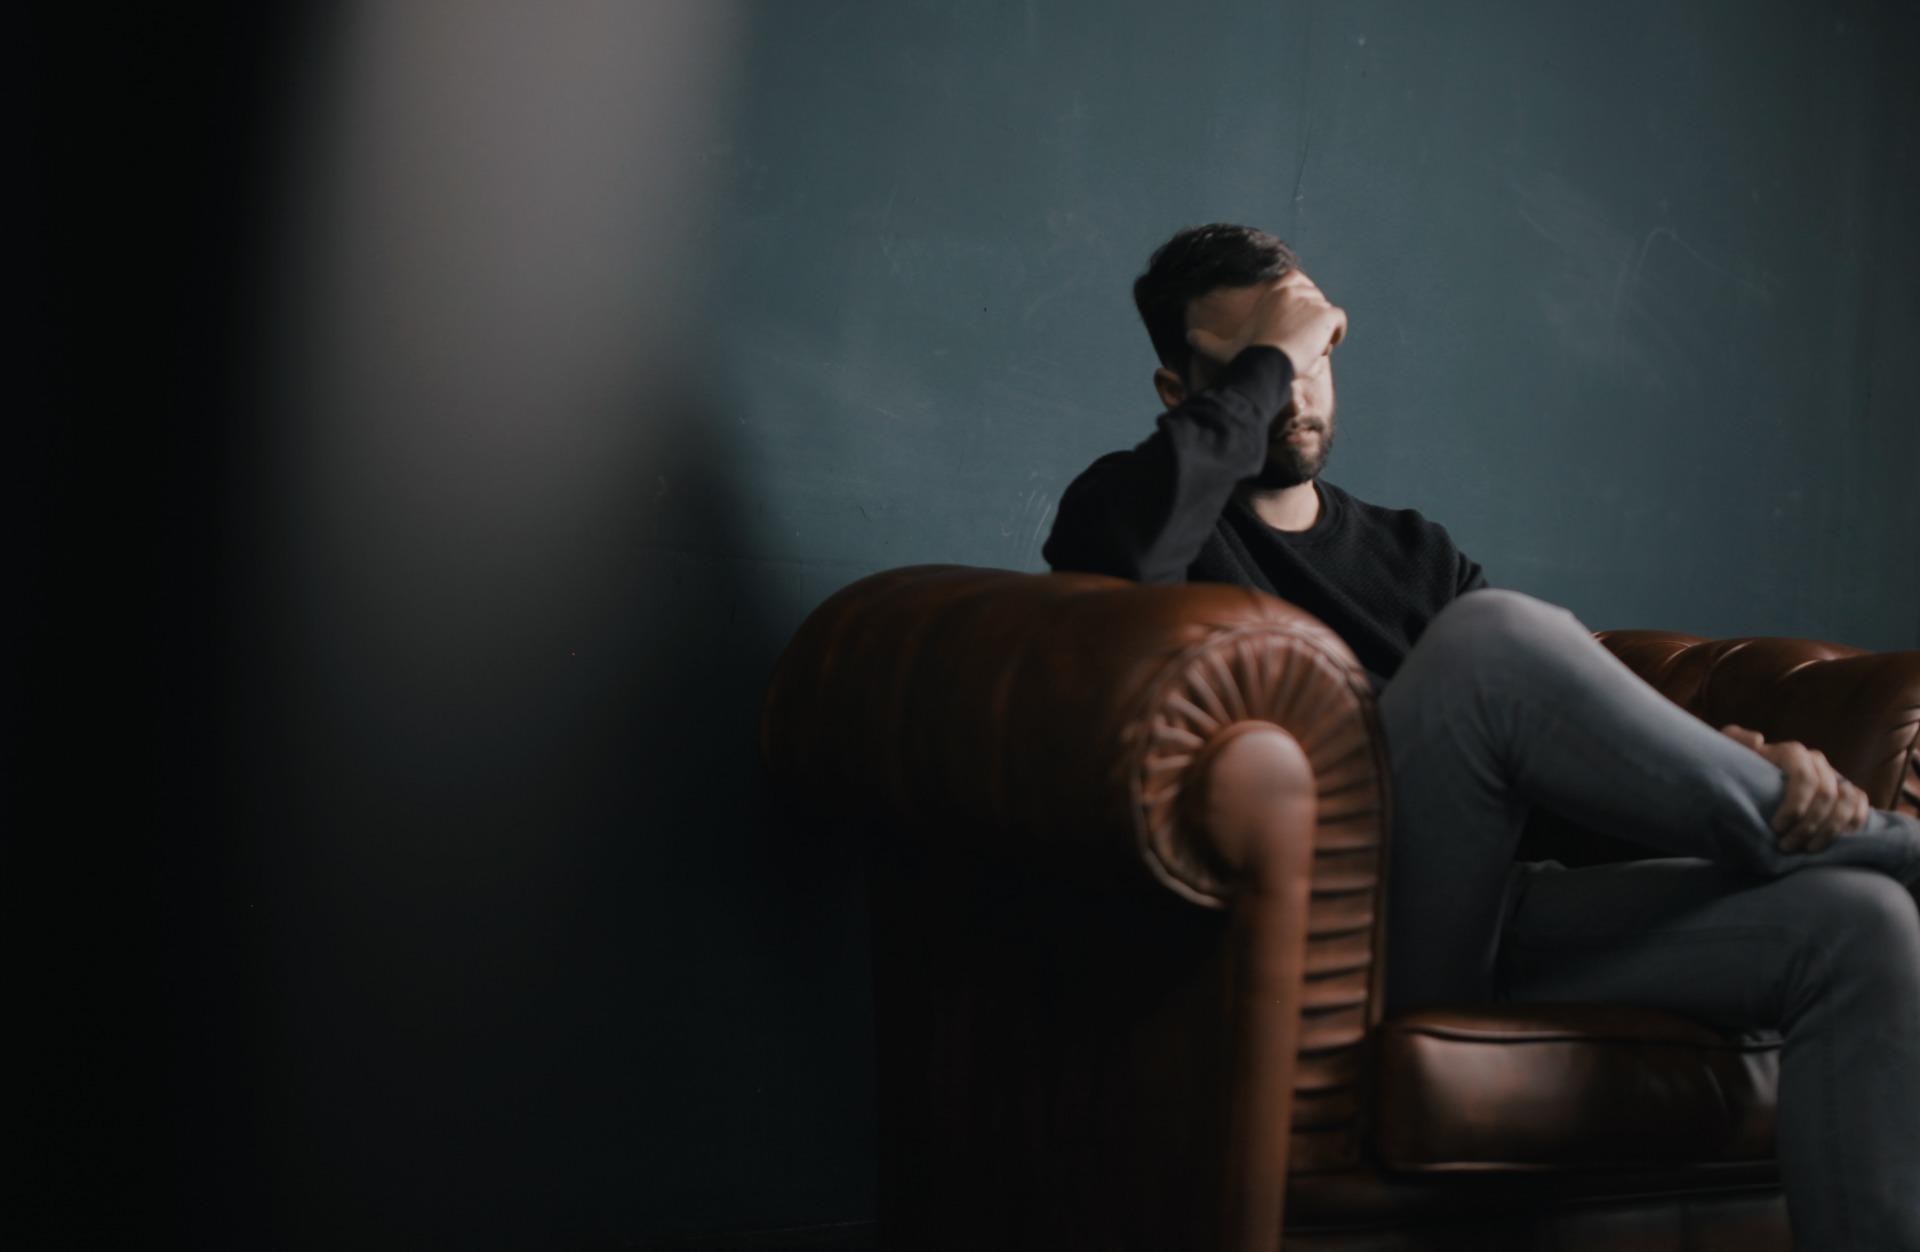 The effectiveness of Internet-based emotion-regulation training